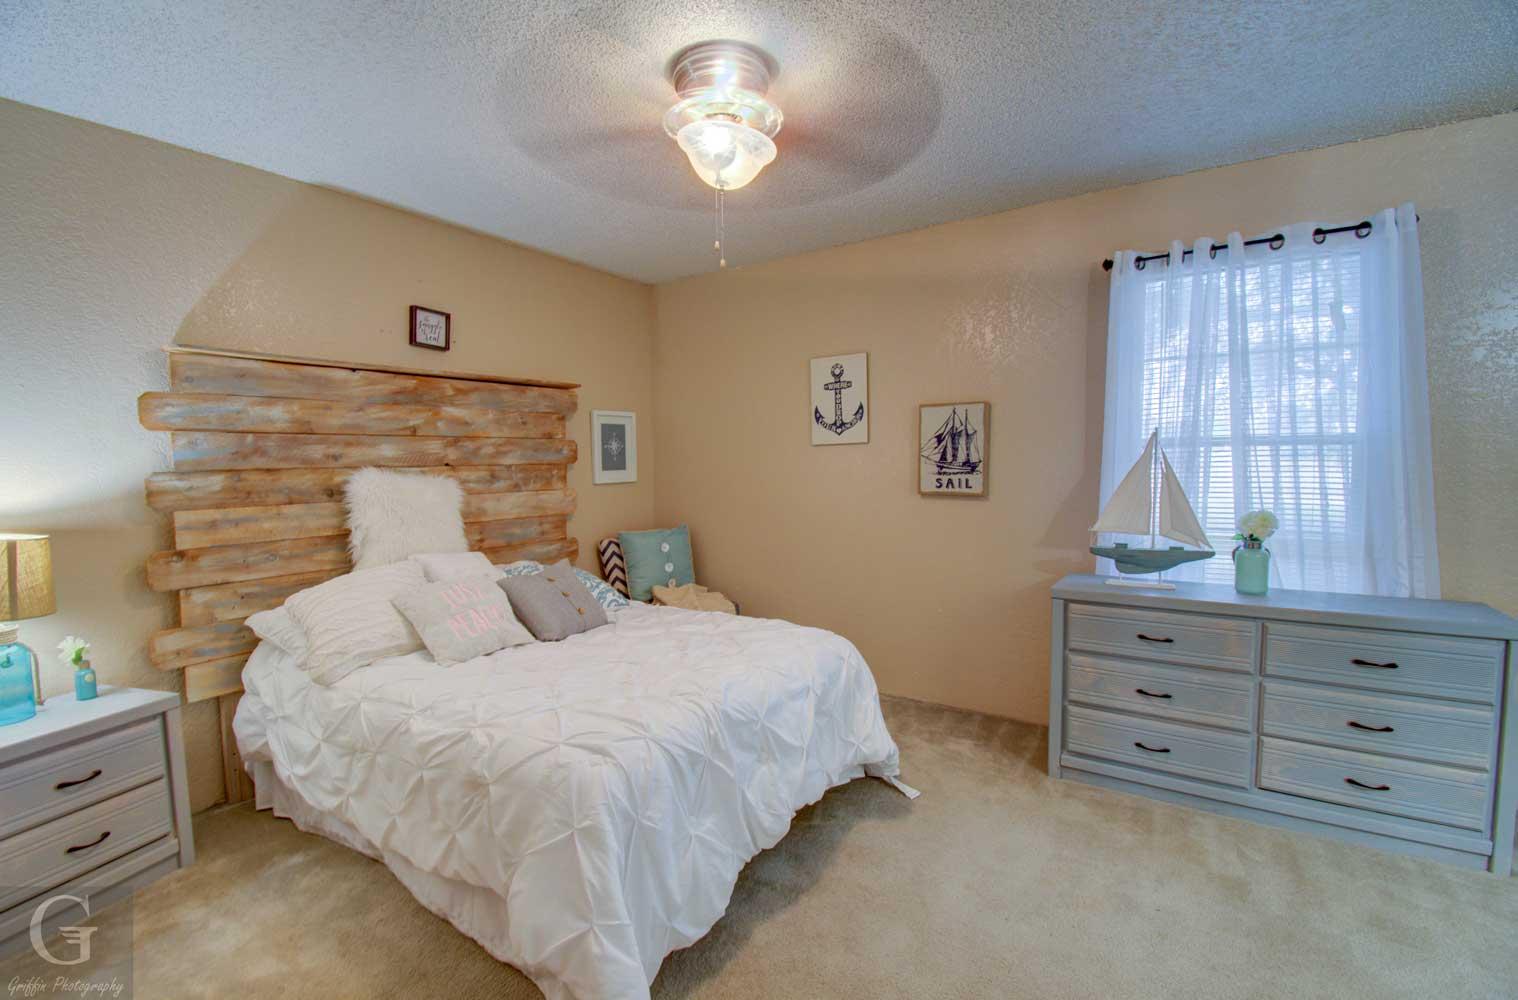 Bedroom at Kingston Village Apartments in Shreveport, LA+